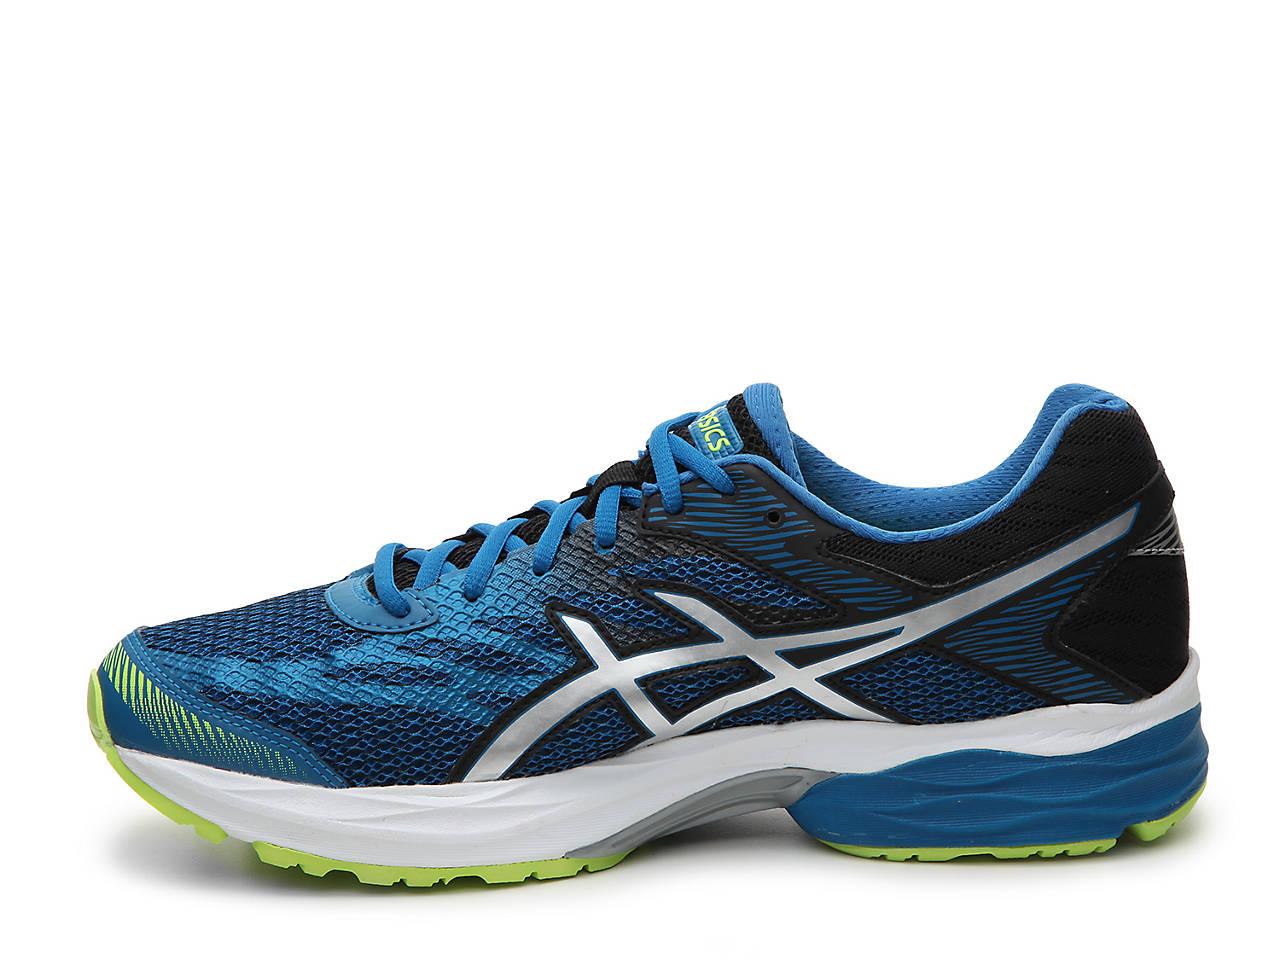 asics shoes zippay review 661396